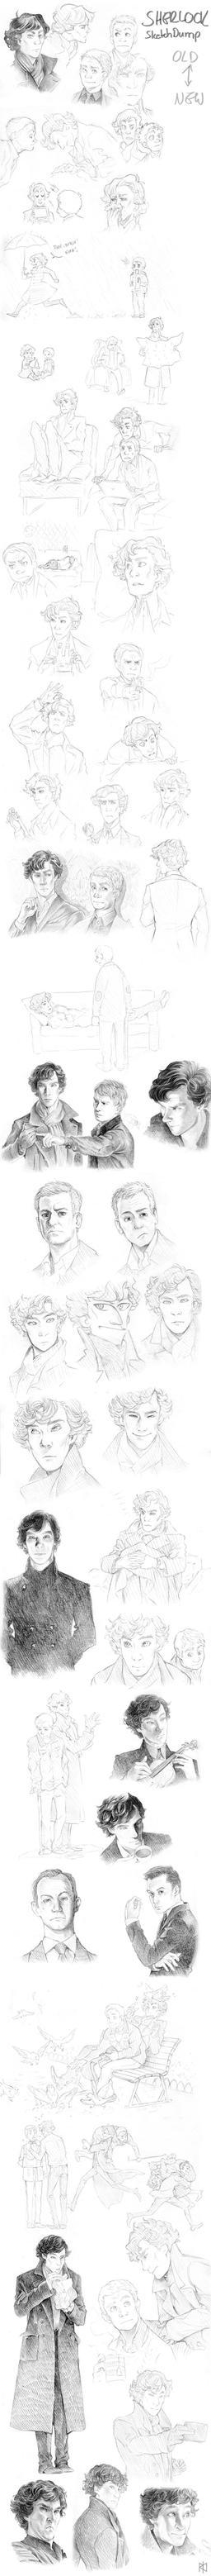 Sherlock Sketchdump by Tamasaburo09